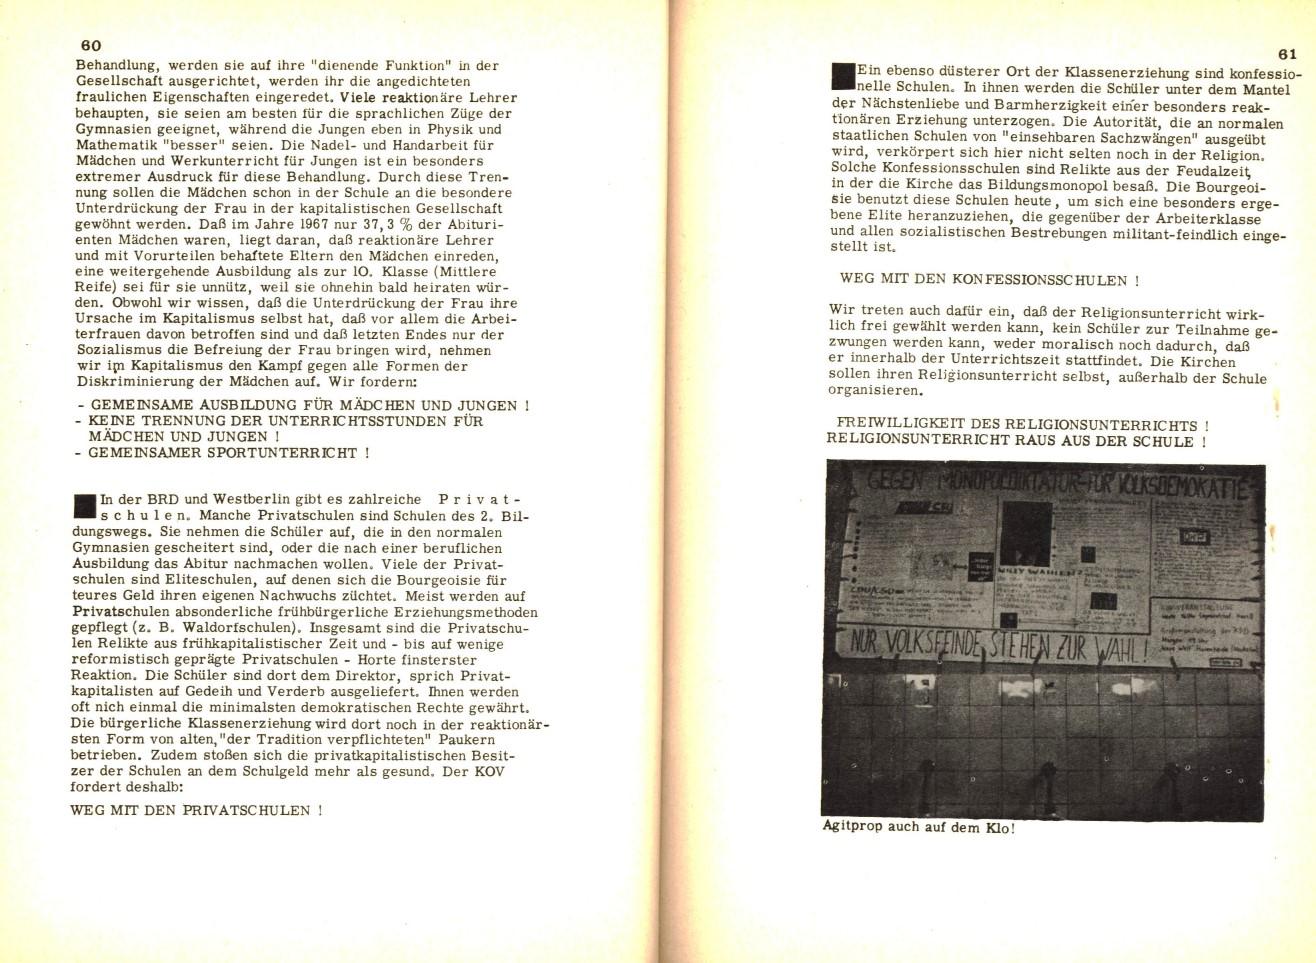 KOV_1973_Aktionsprogramm_33